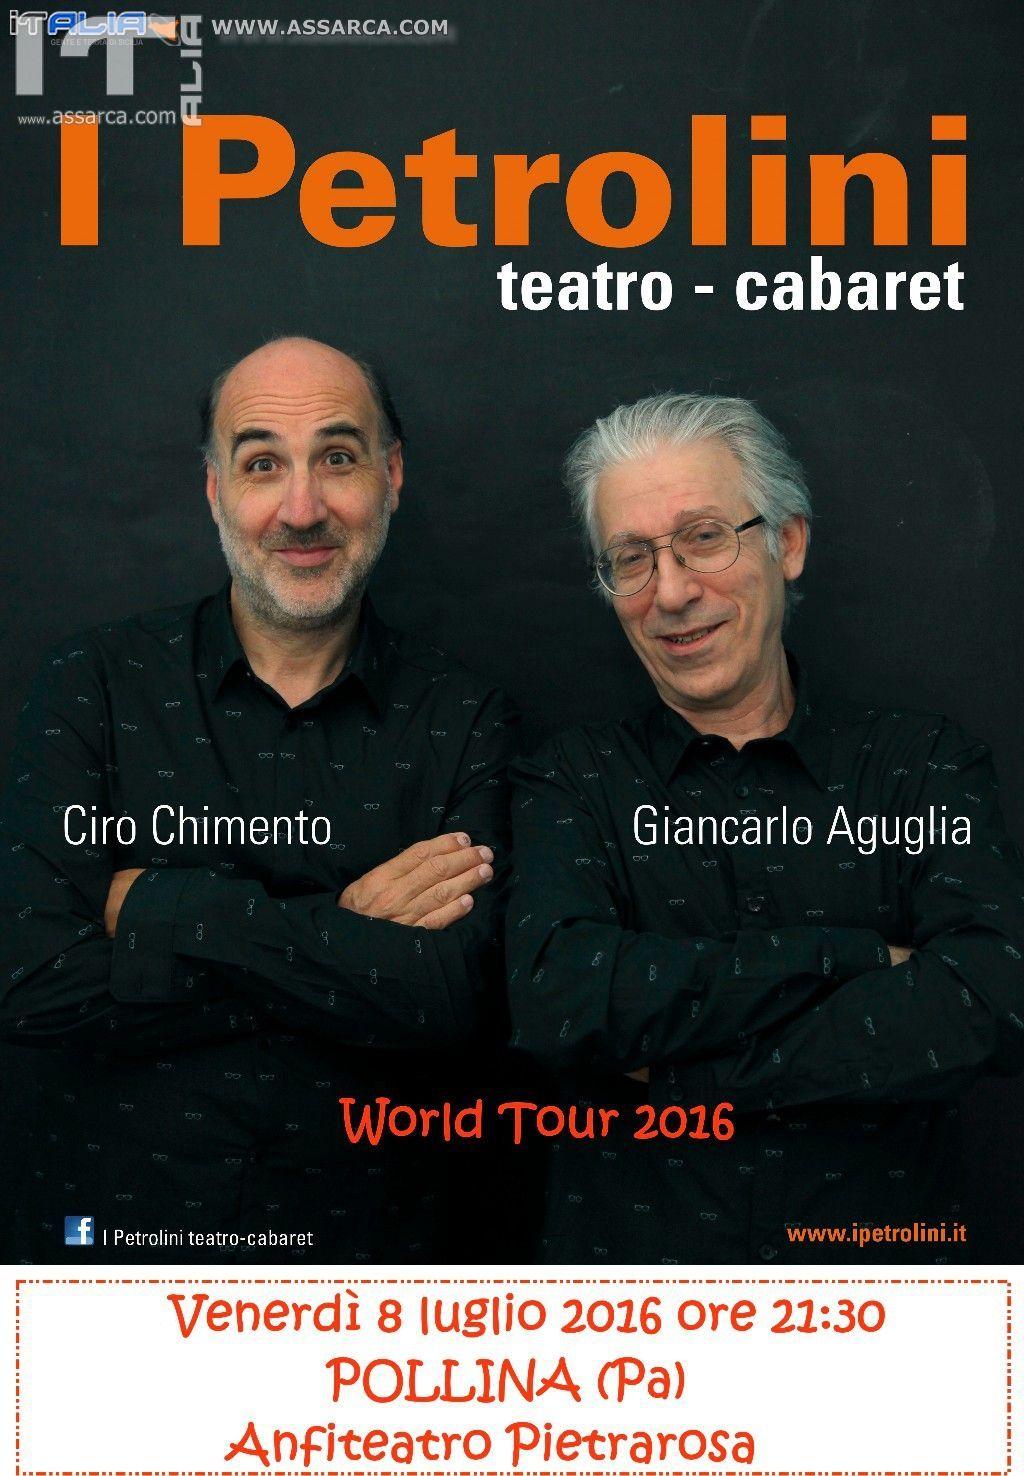 I PETROLINI WORLD TOUR 2016, VENERDÌ 8 LUGLIO ORE 21:30 ANFI...